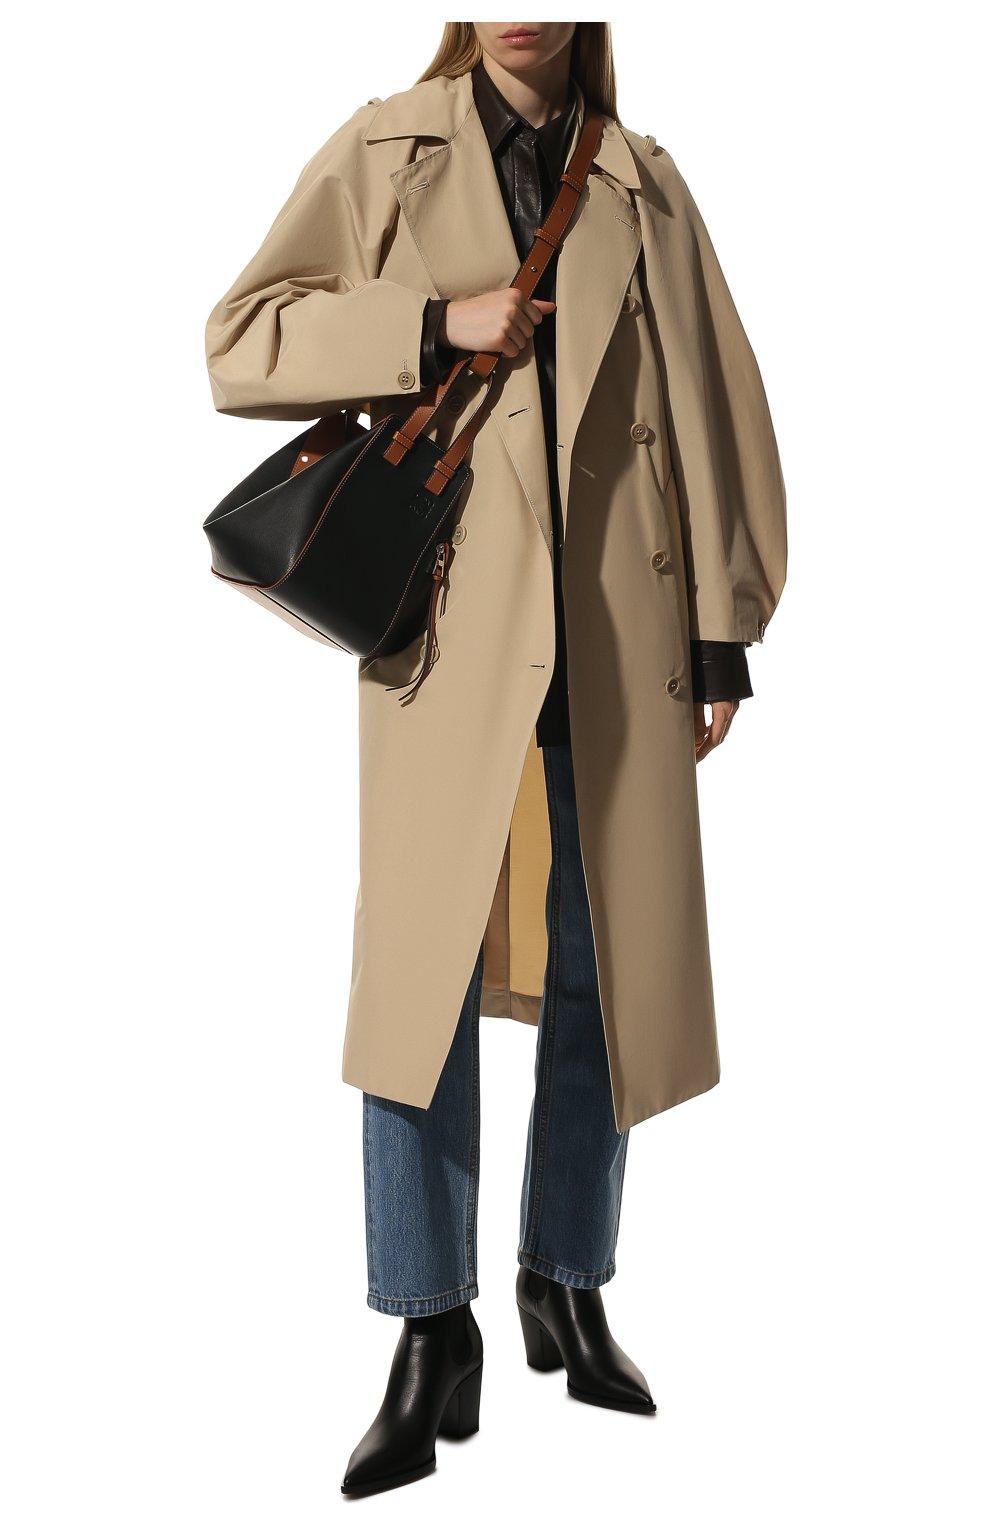 Женская сумка hammock small LOEWE черного цвета, арт. A538S35X04   Фото 3 (Сумки-технические: Сумки через плечо, Сумки top-handle; Материал: Натуральная кожа; Ремень/цепочка: На ремешке; Размер: small)